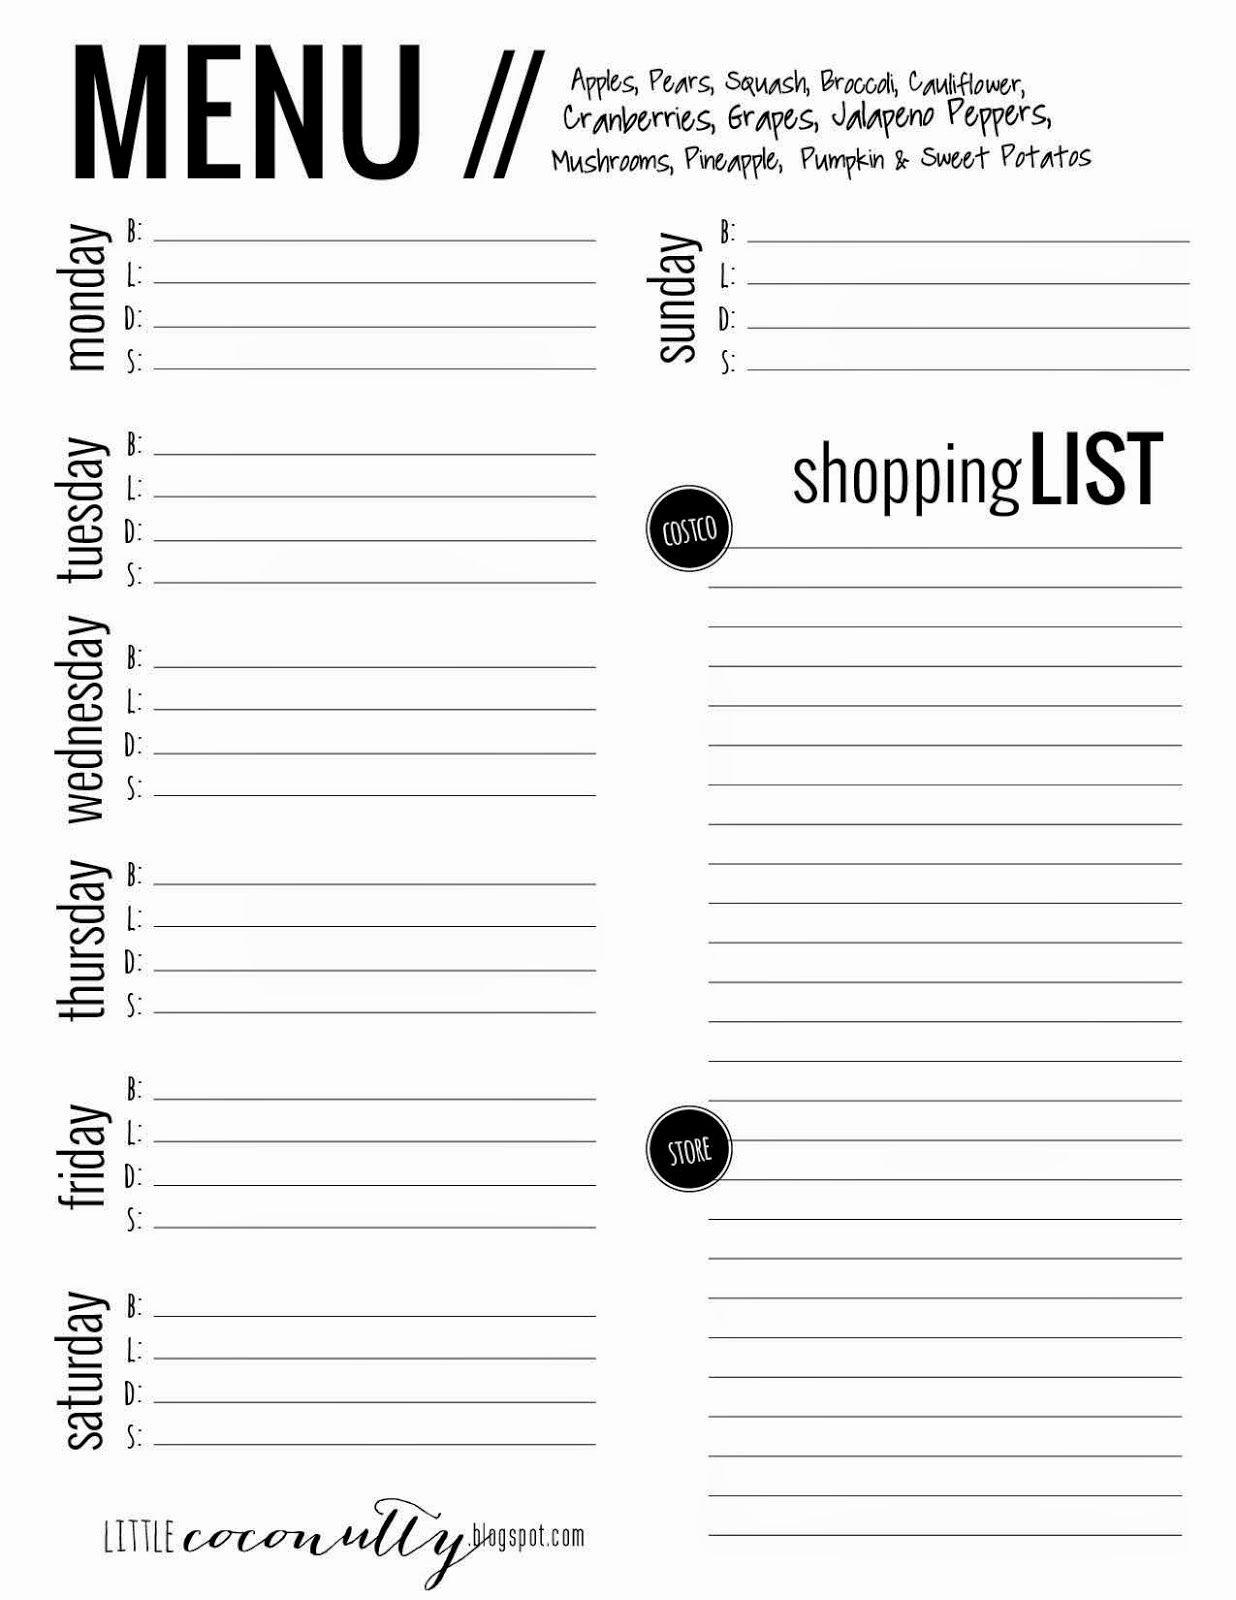 Menu Planner Template Printable New Little Coconutty Free Menu Planner Printable Grocery